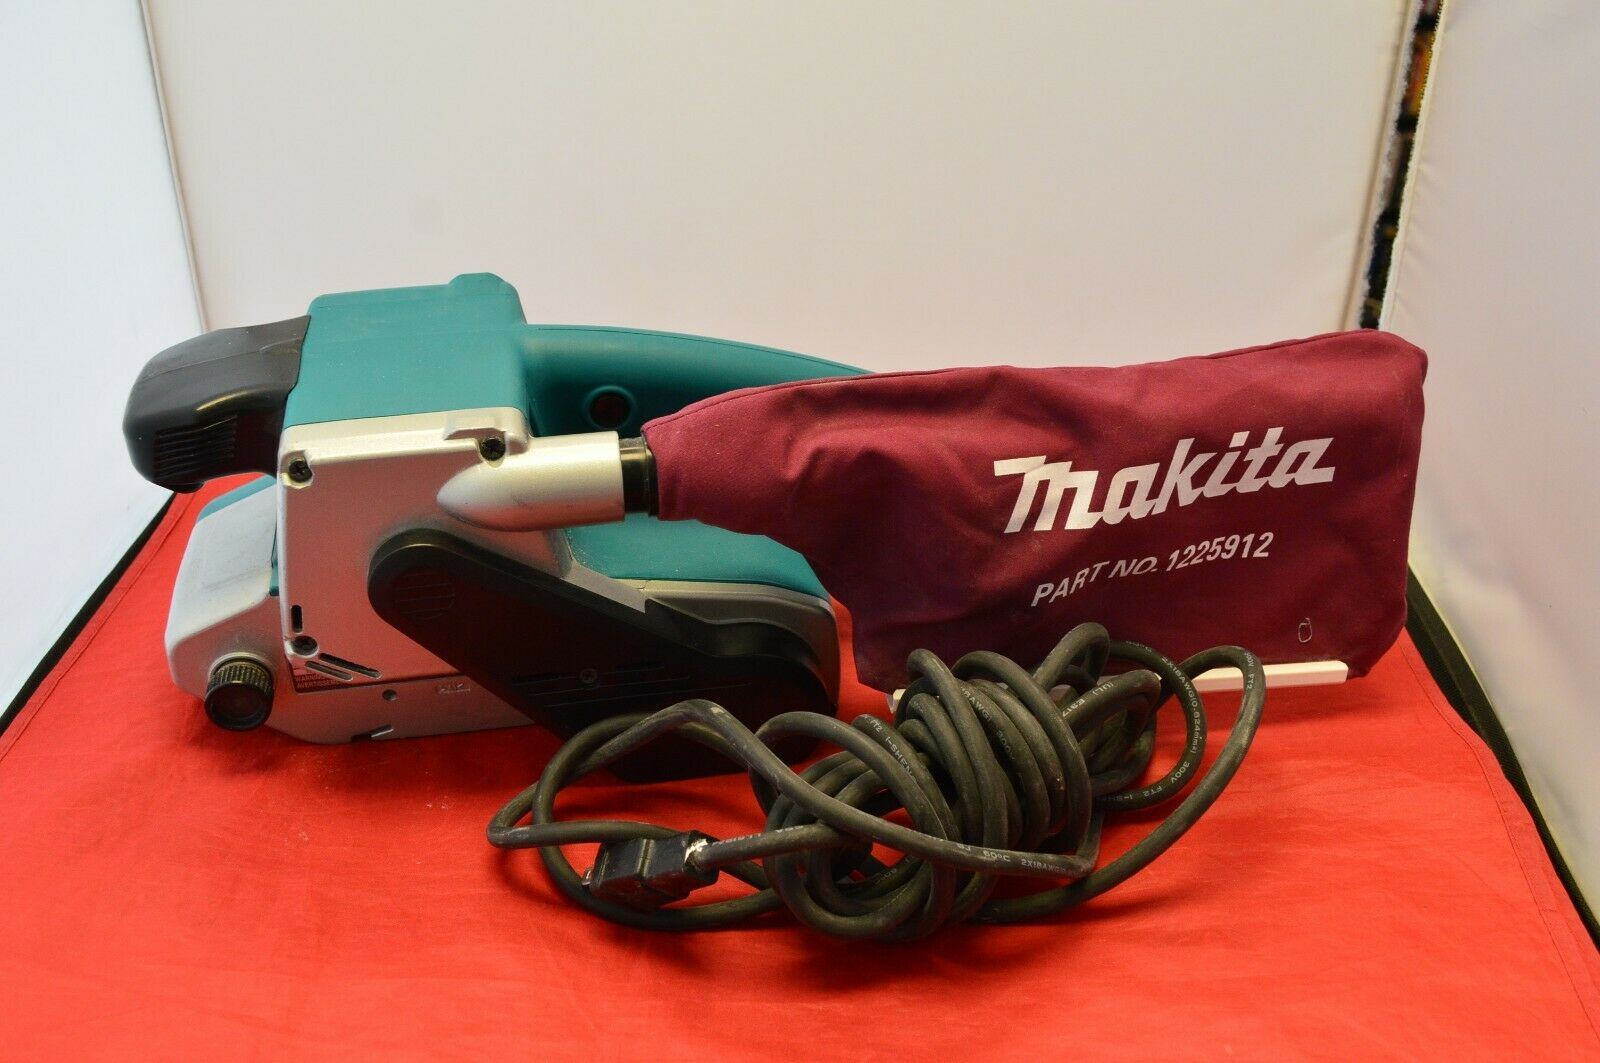 Makita 9903 3 x 21 Belt Sanders